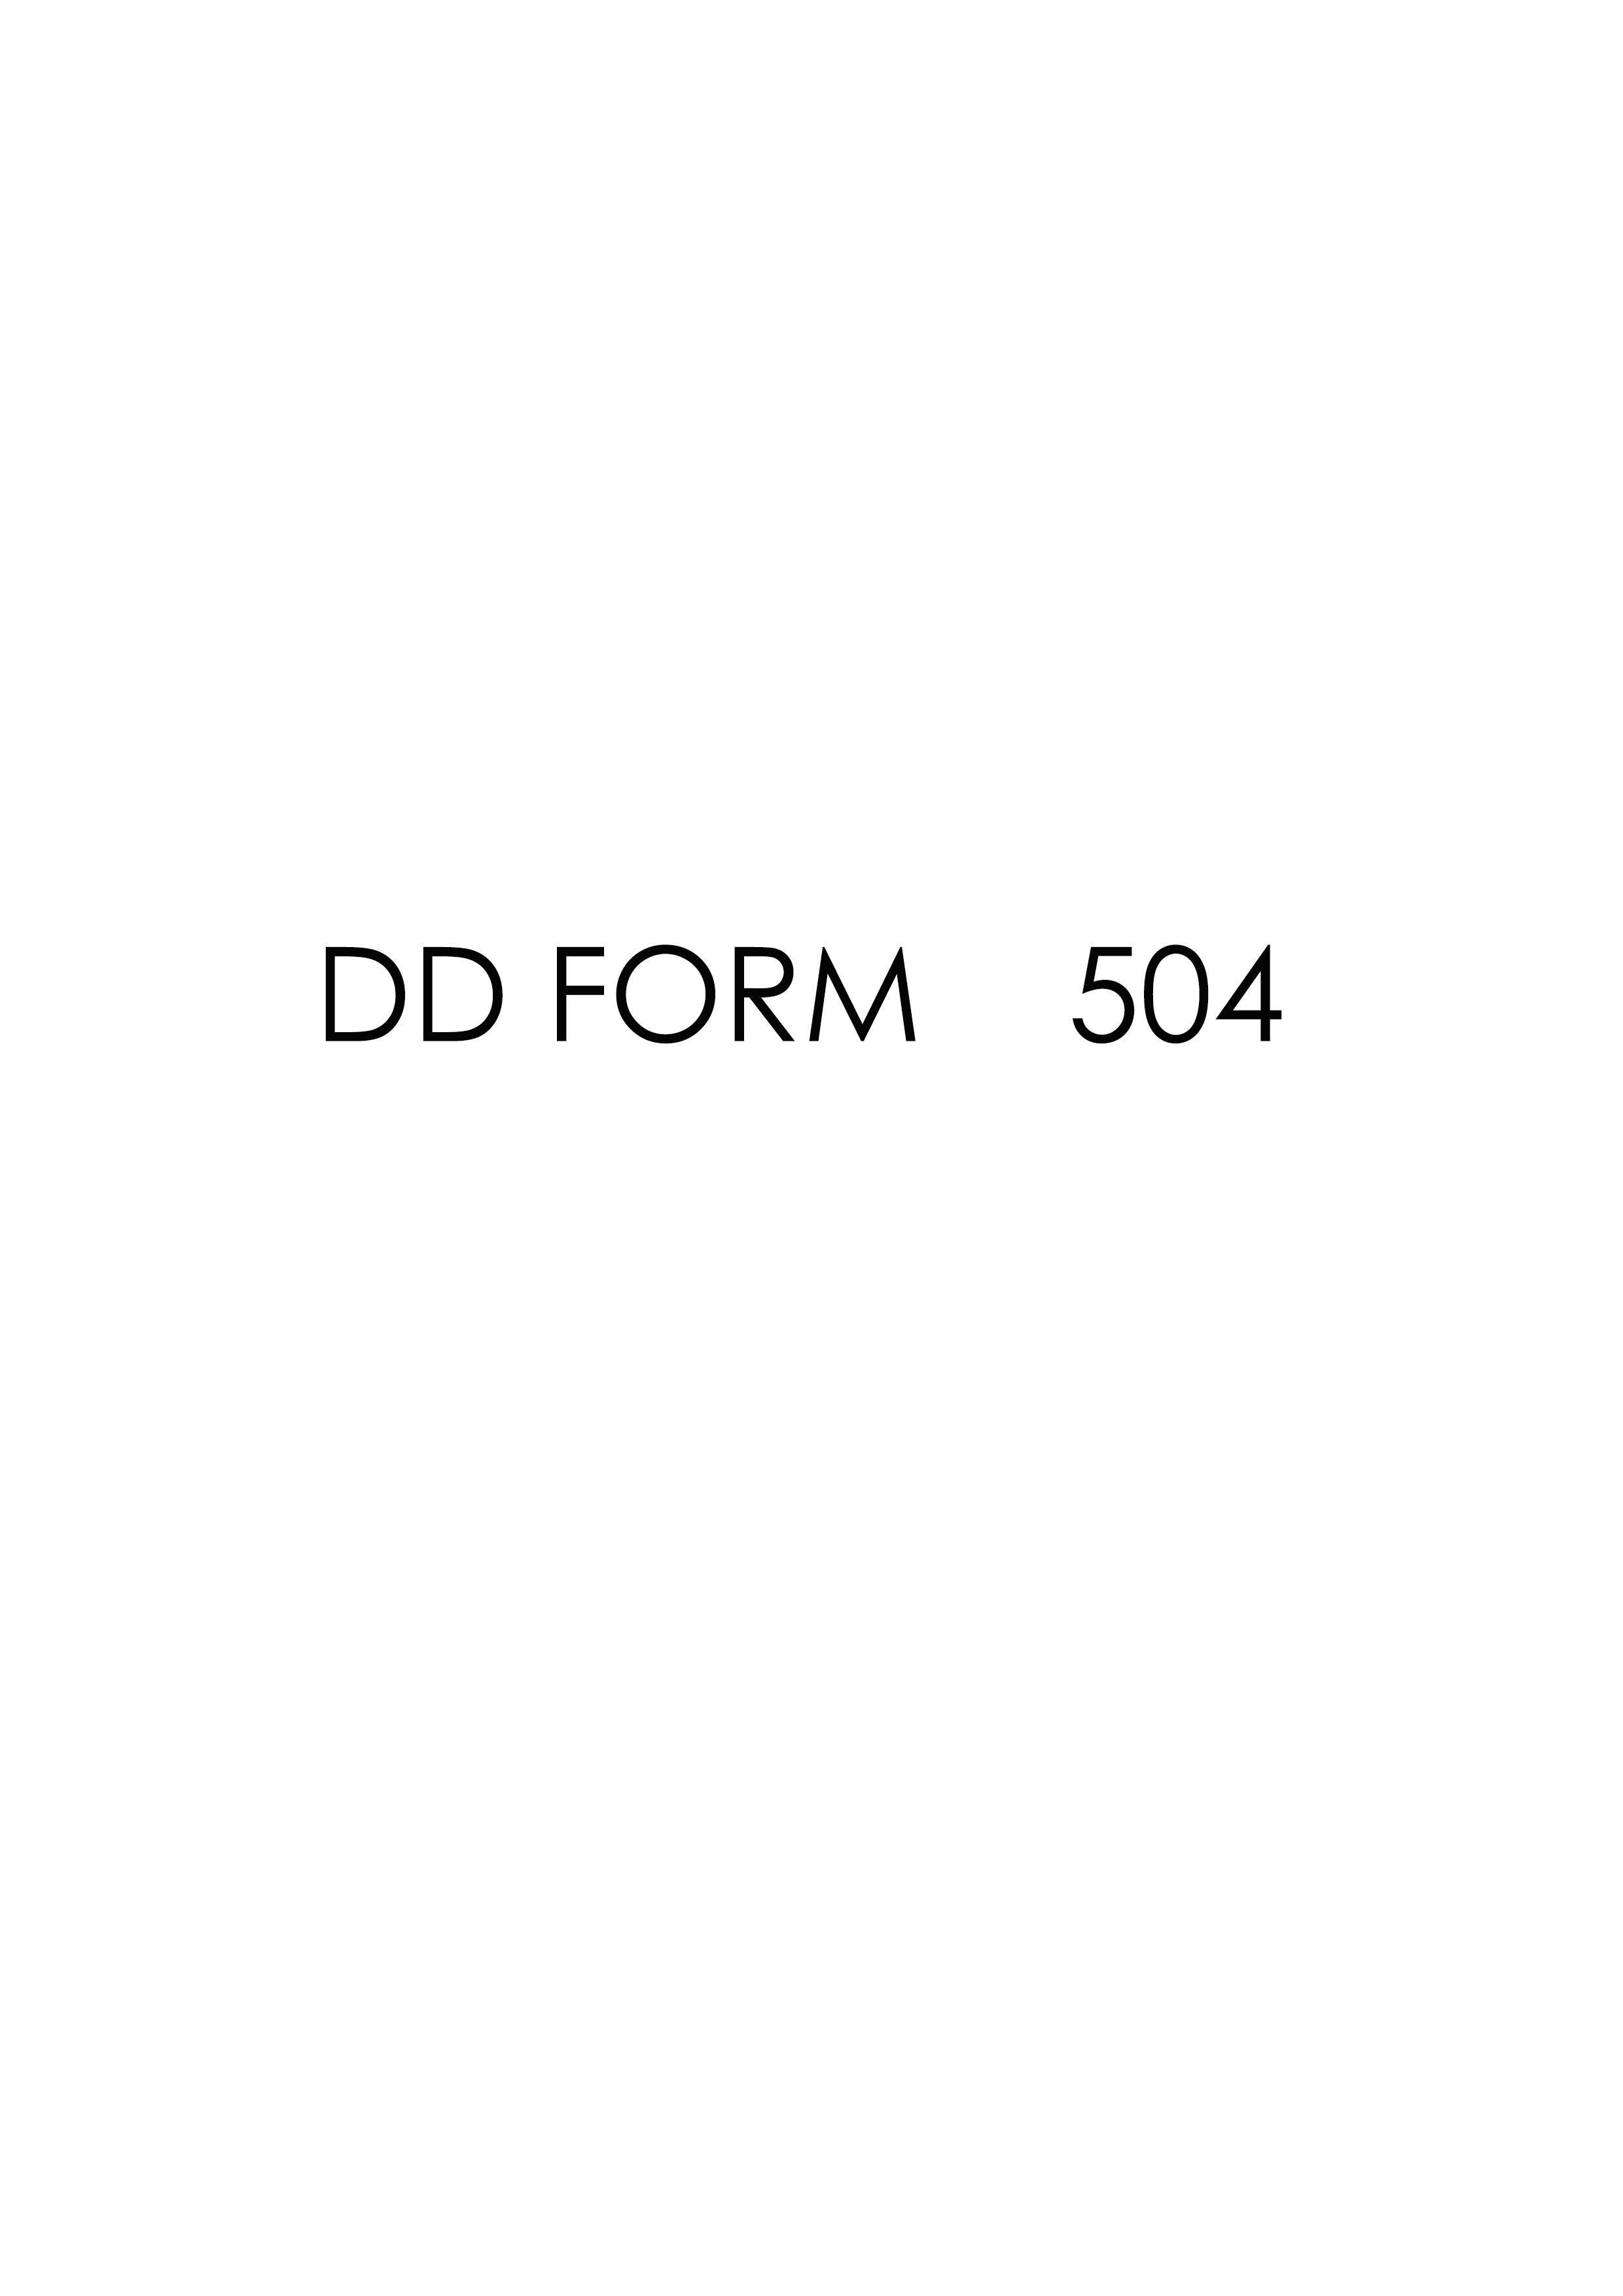 Download dd Form 504 Free